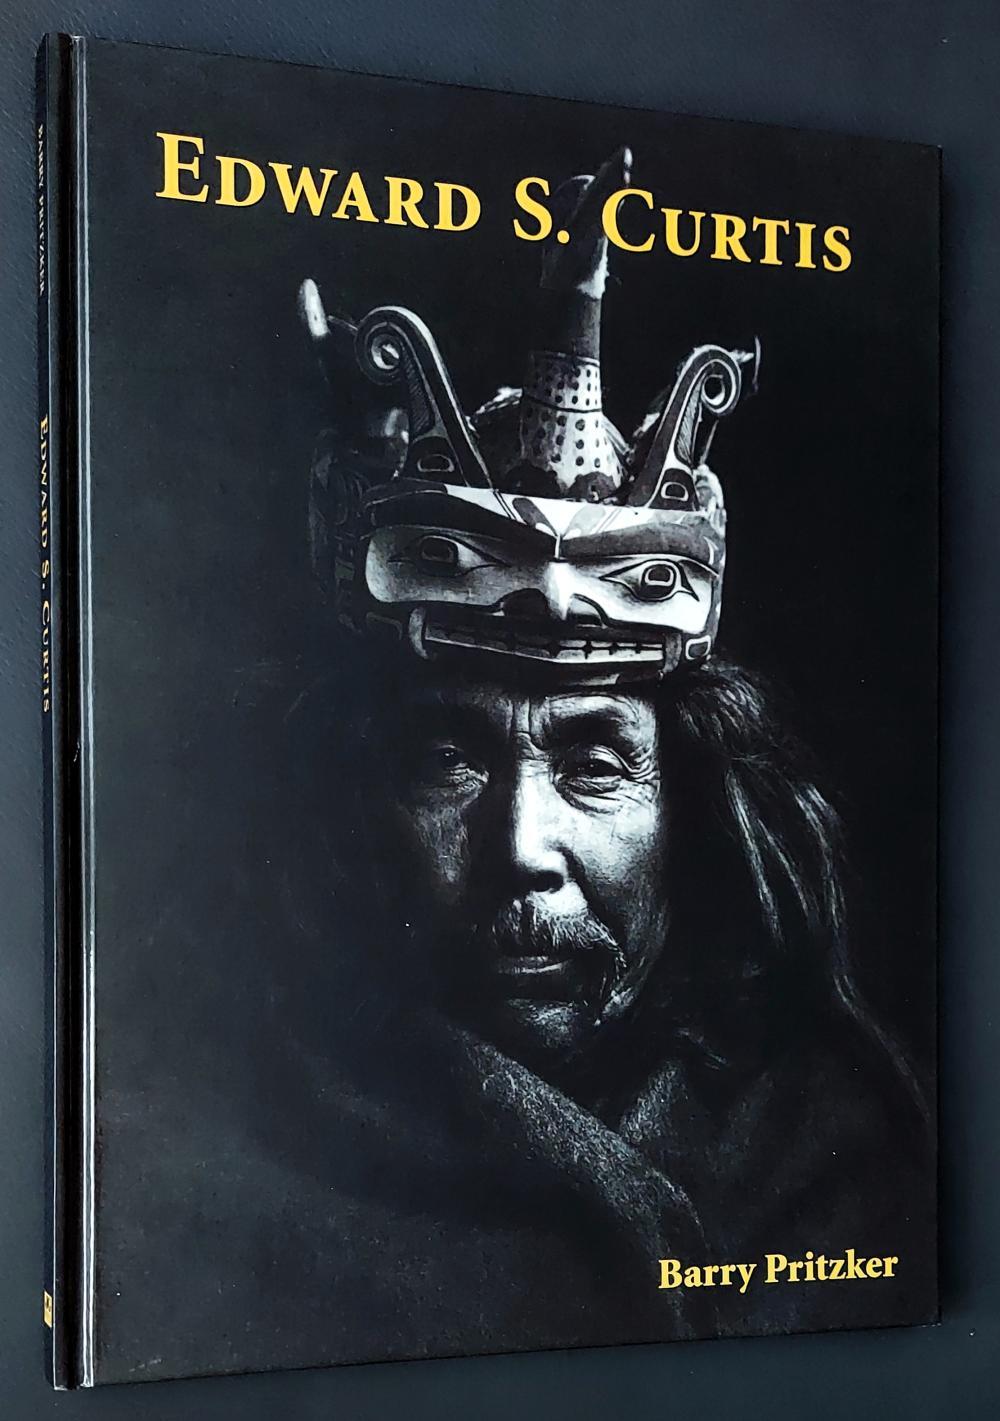 Edward S. Curtis: Photographs, 2005